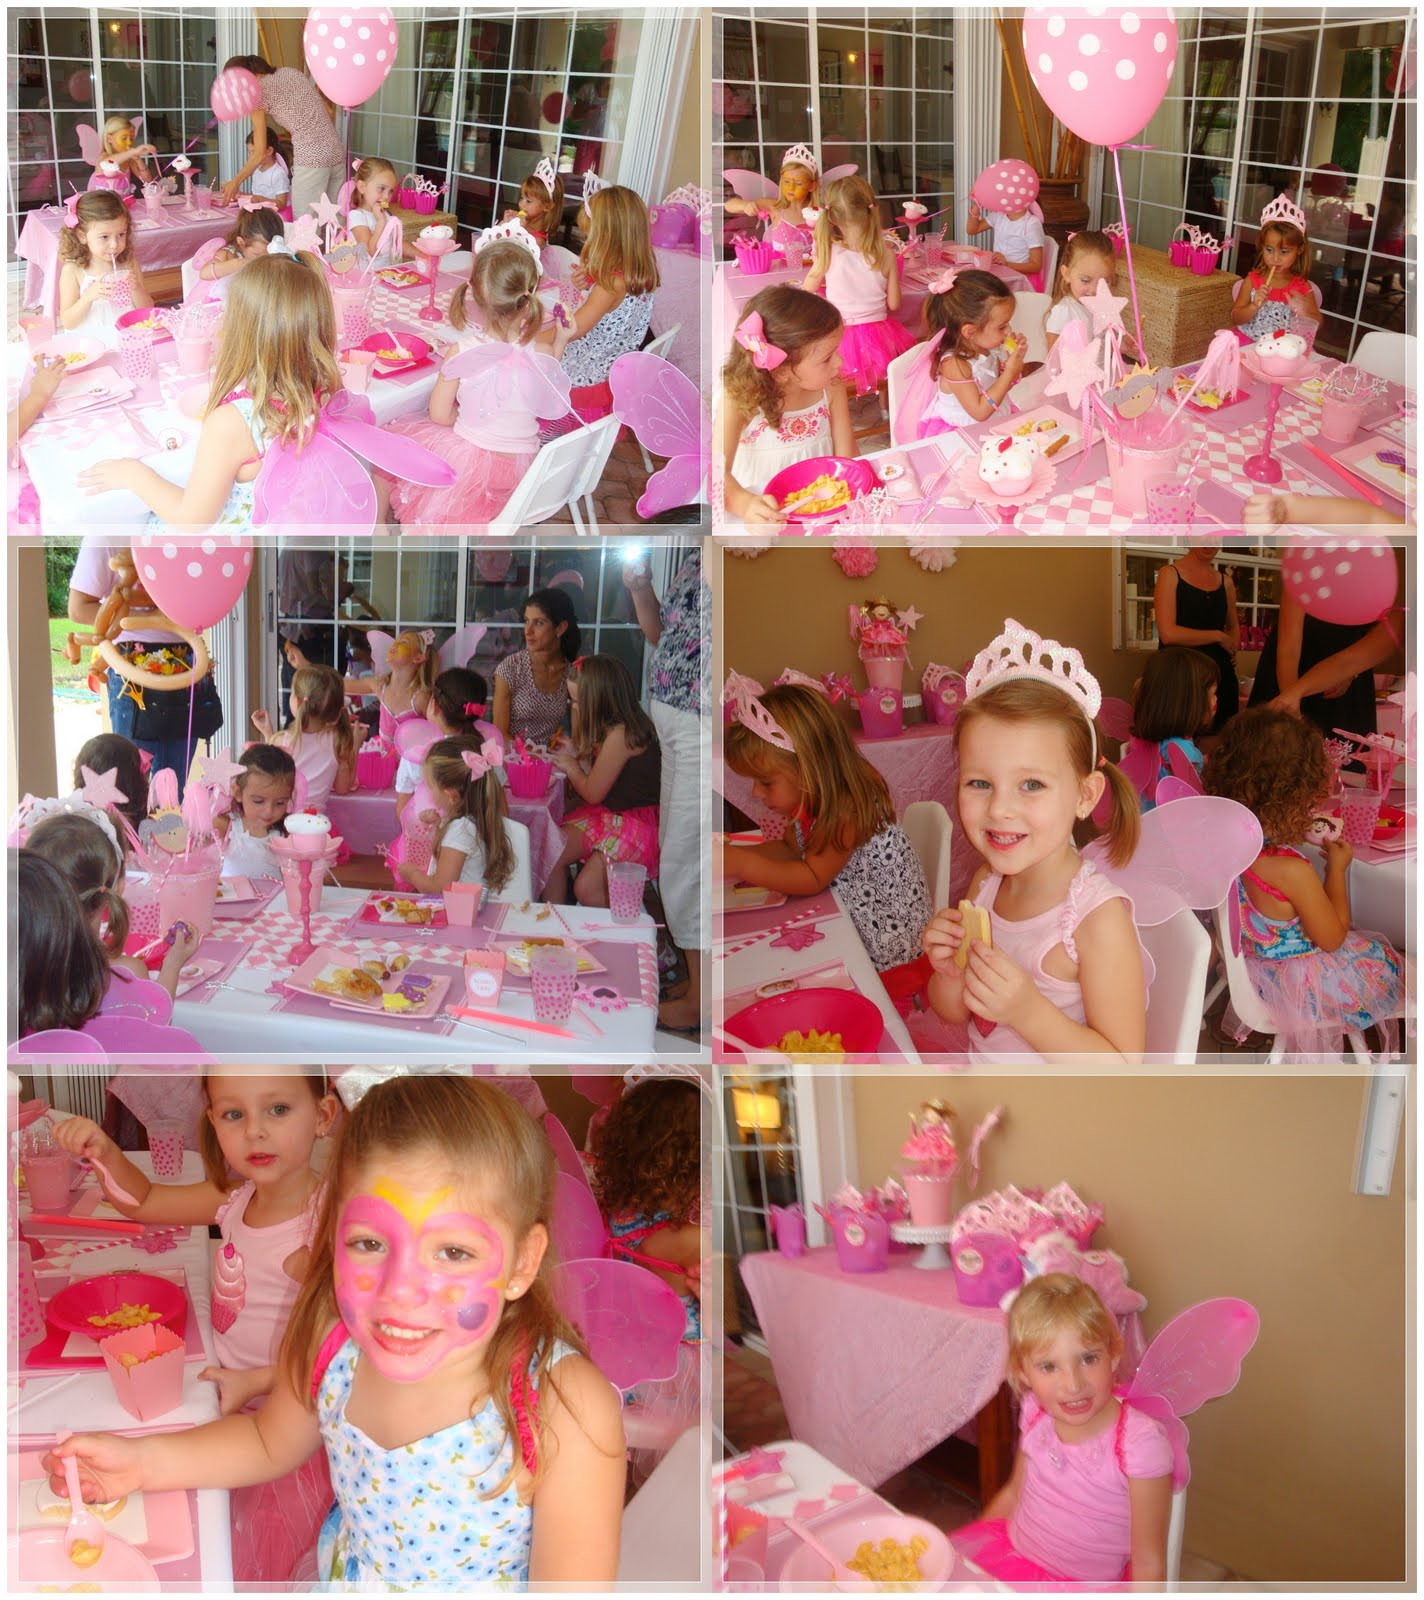 sweet bambinos Real Party